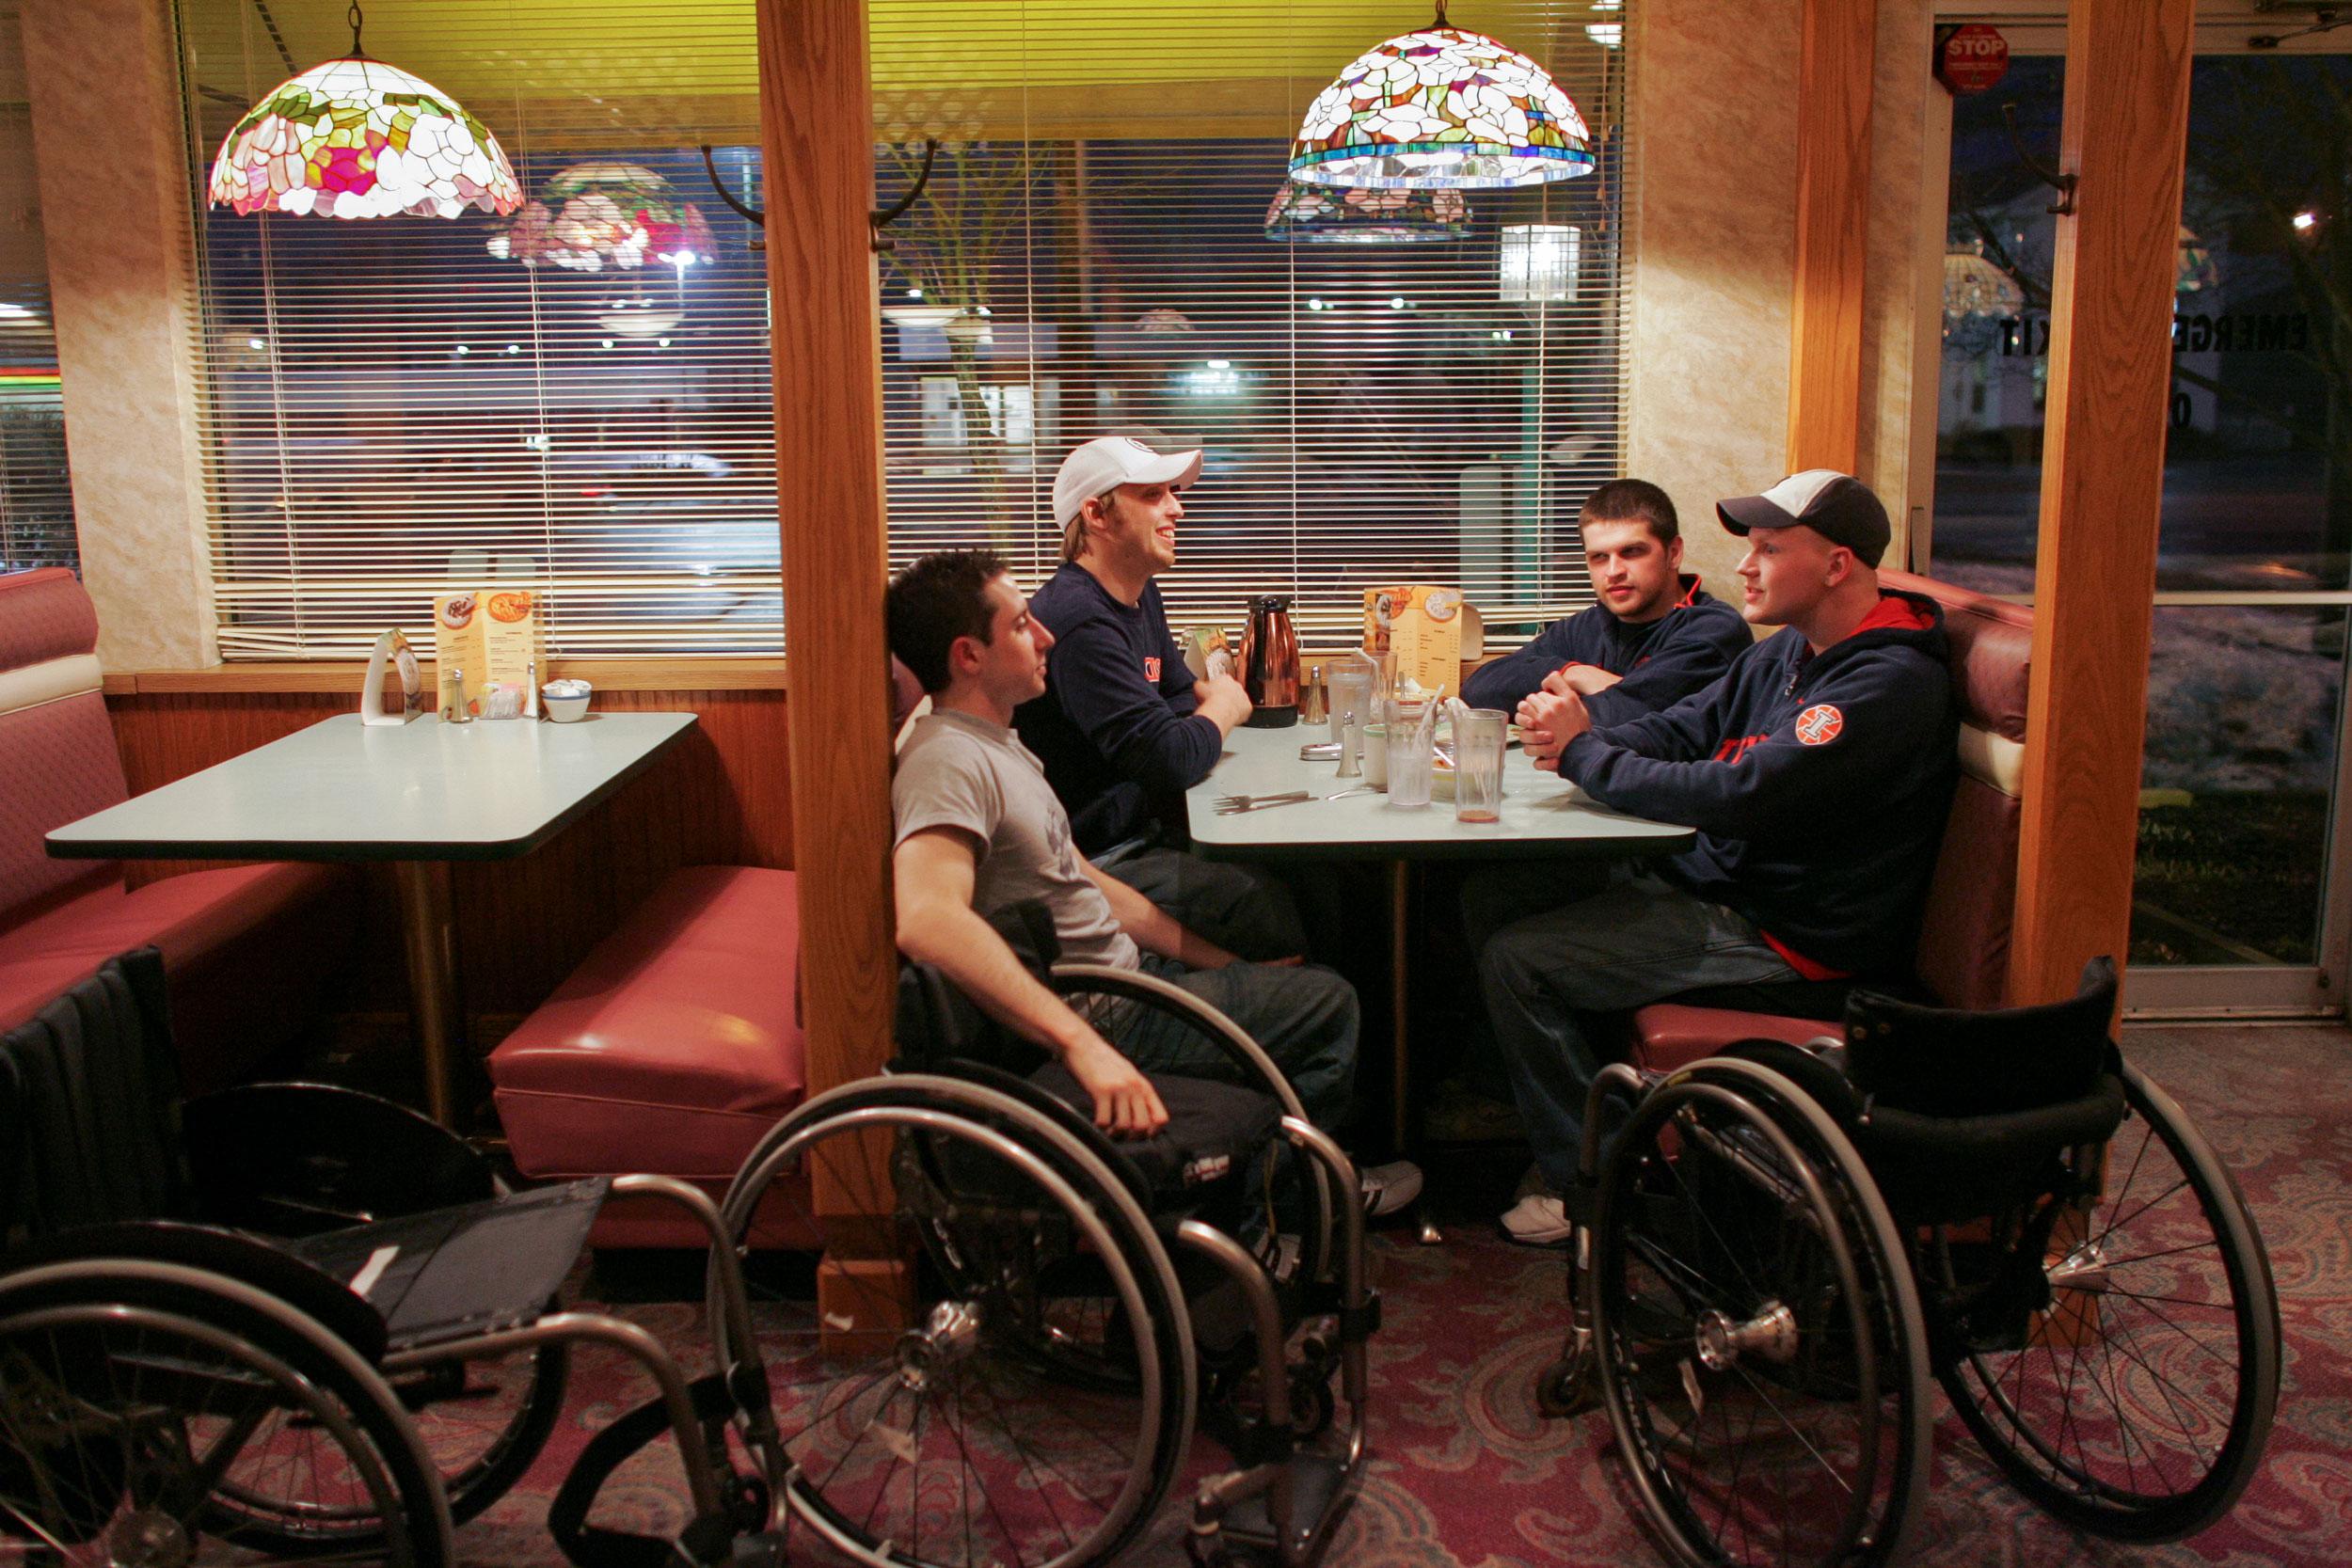 From left, Steve Serio, Brandon Wagner, Brian Sheehan, and Matt Buchi eat dinner together at Perkins Family Restaurant after an Edinboro University tournament.